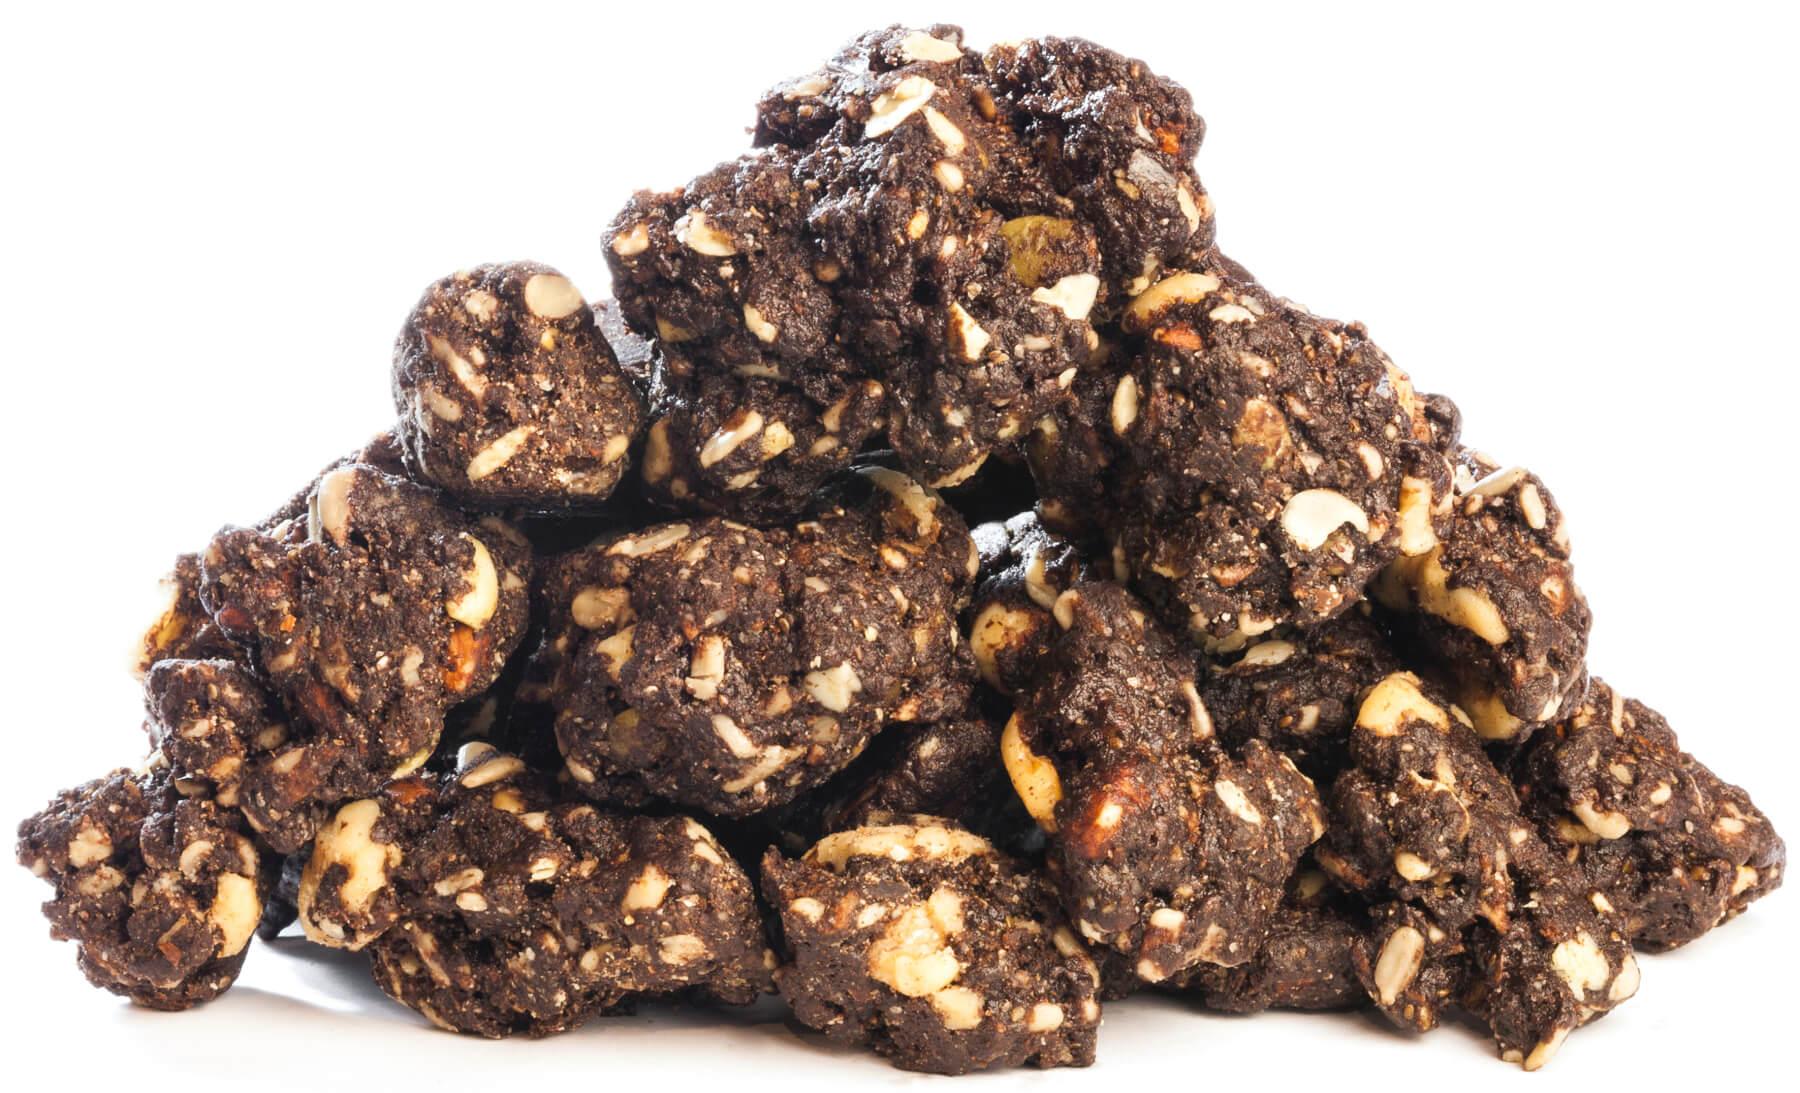 Chocolate Nut Crunch